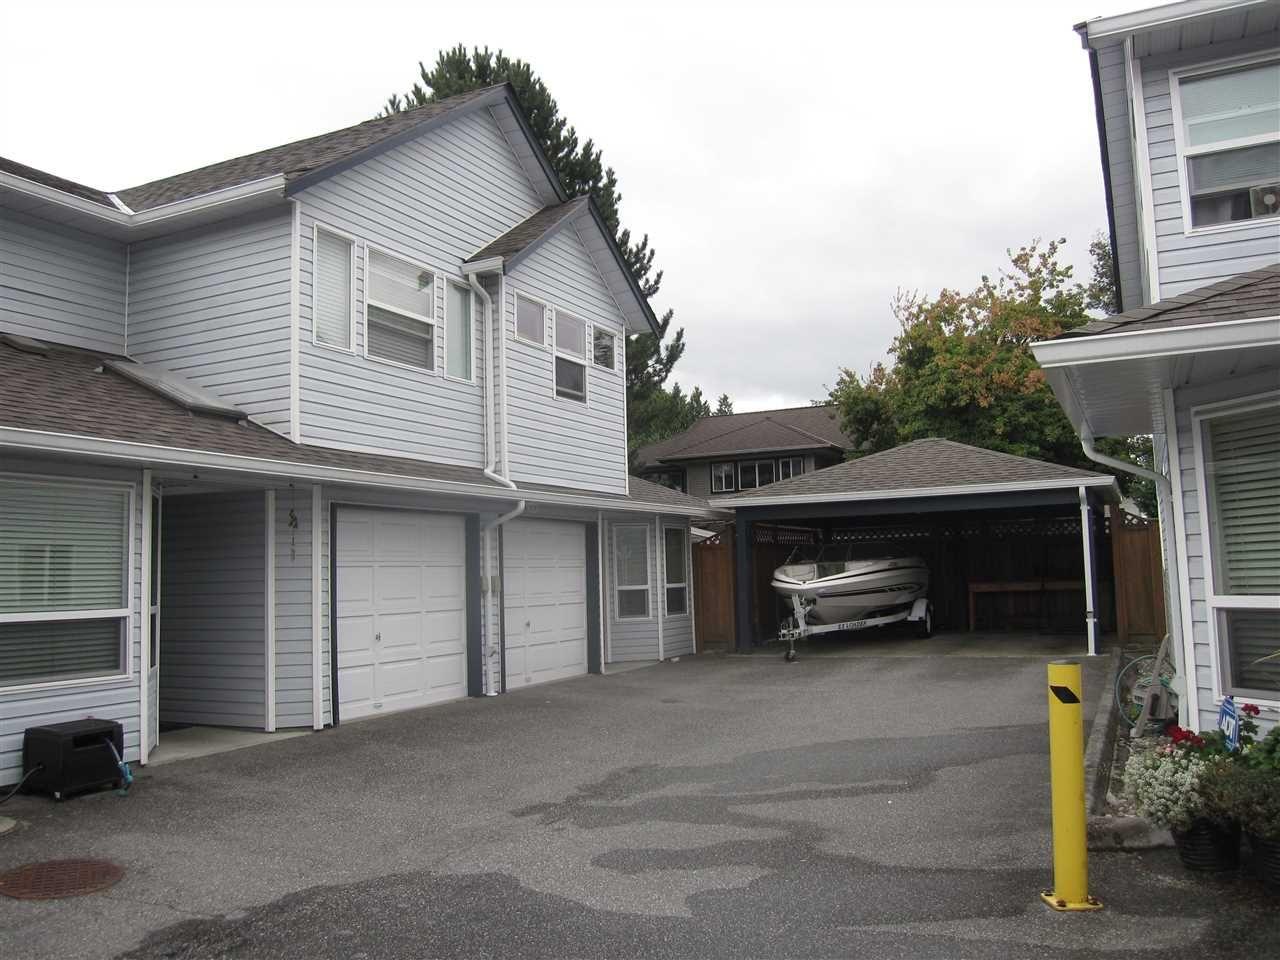 "Main Photo: 23 20630 118 Avenue in Maple Ridge: Southwest Maple Ridge Townhouse for sale in ""Westgate Terrace"" : MLS®# R2392610"